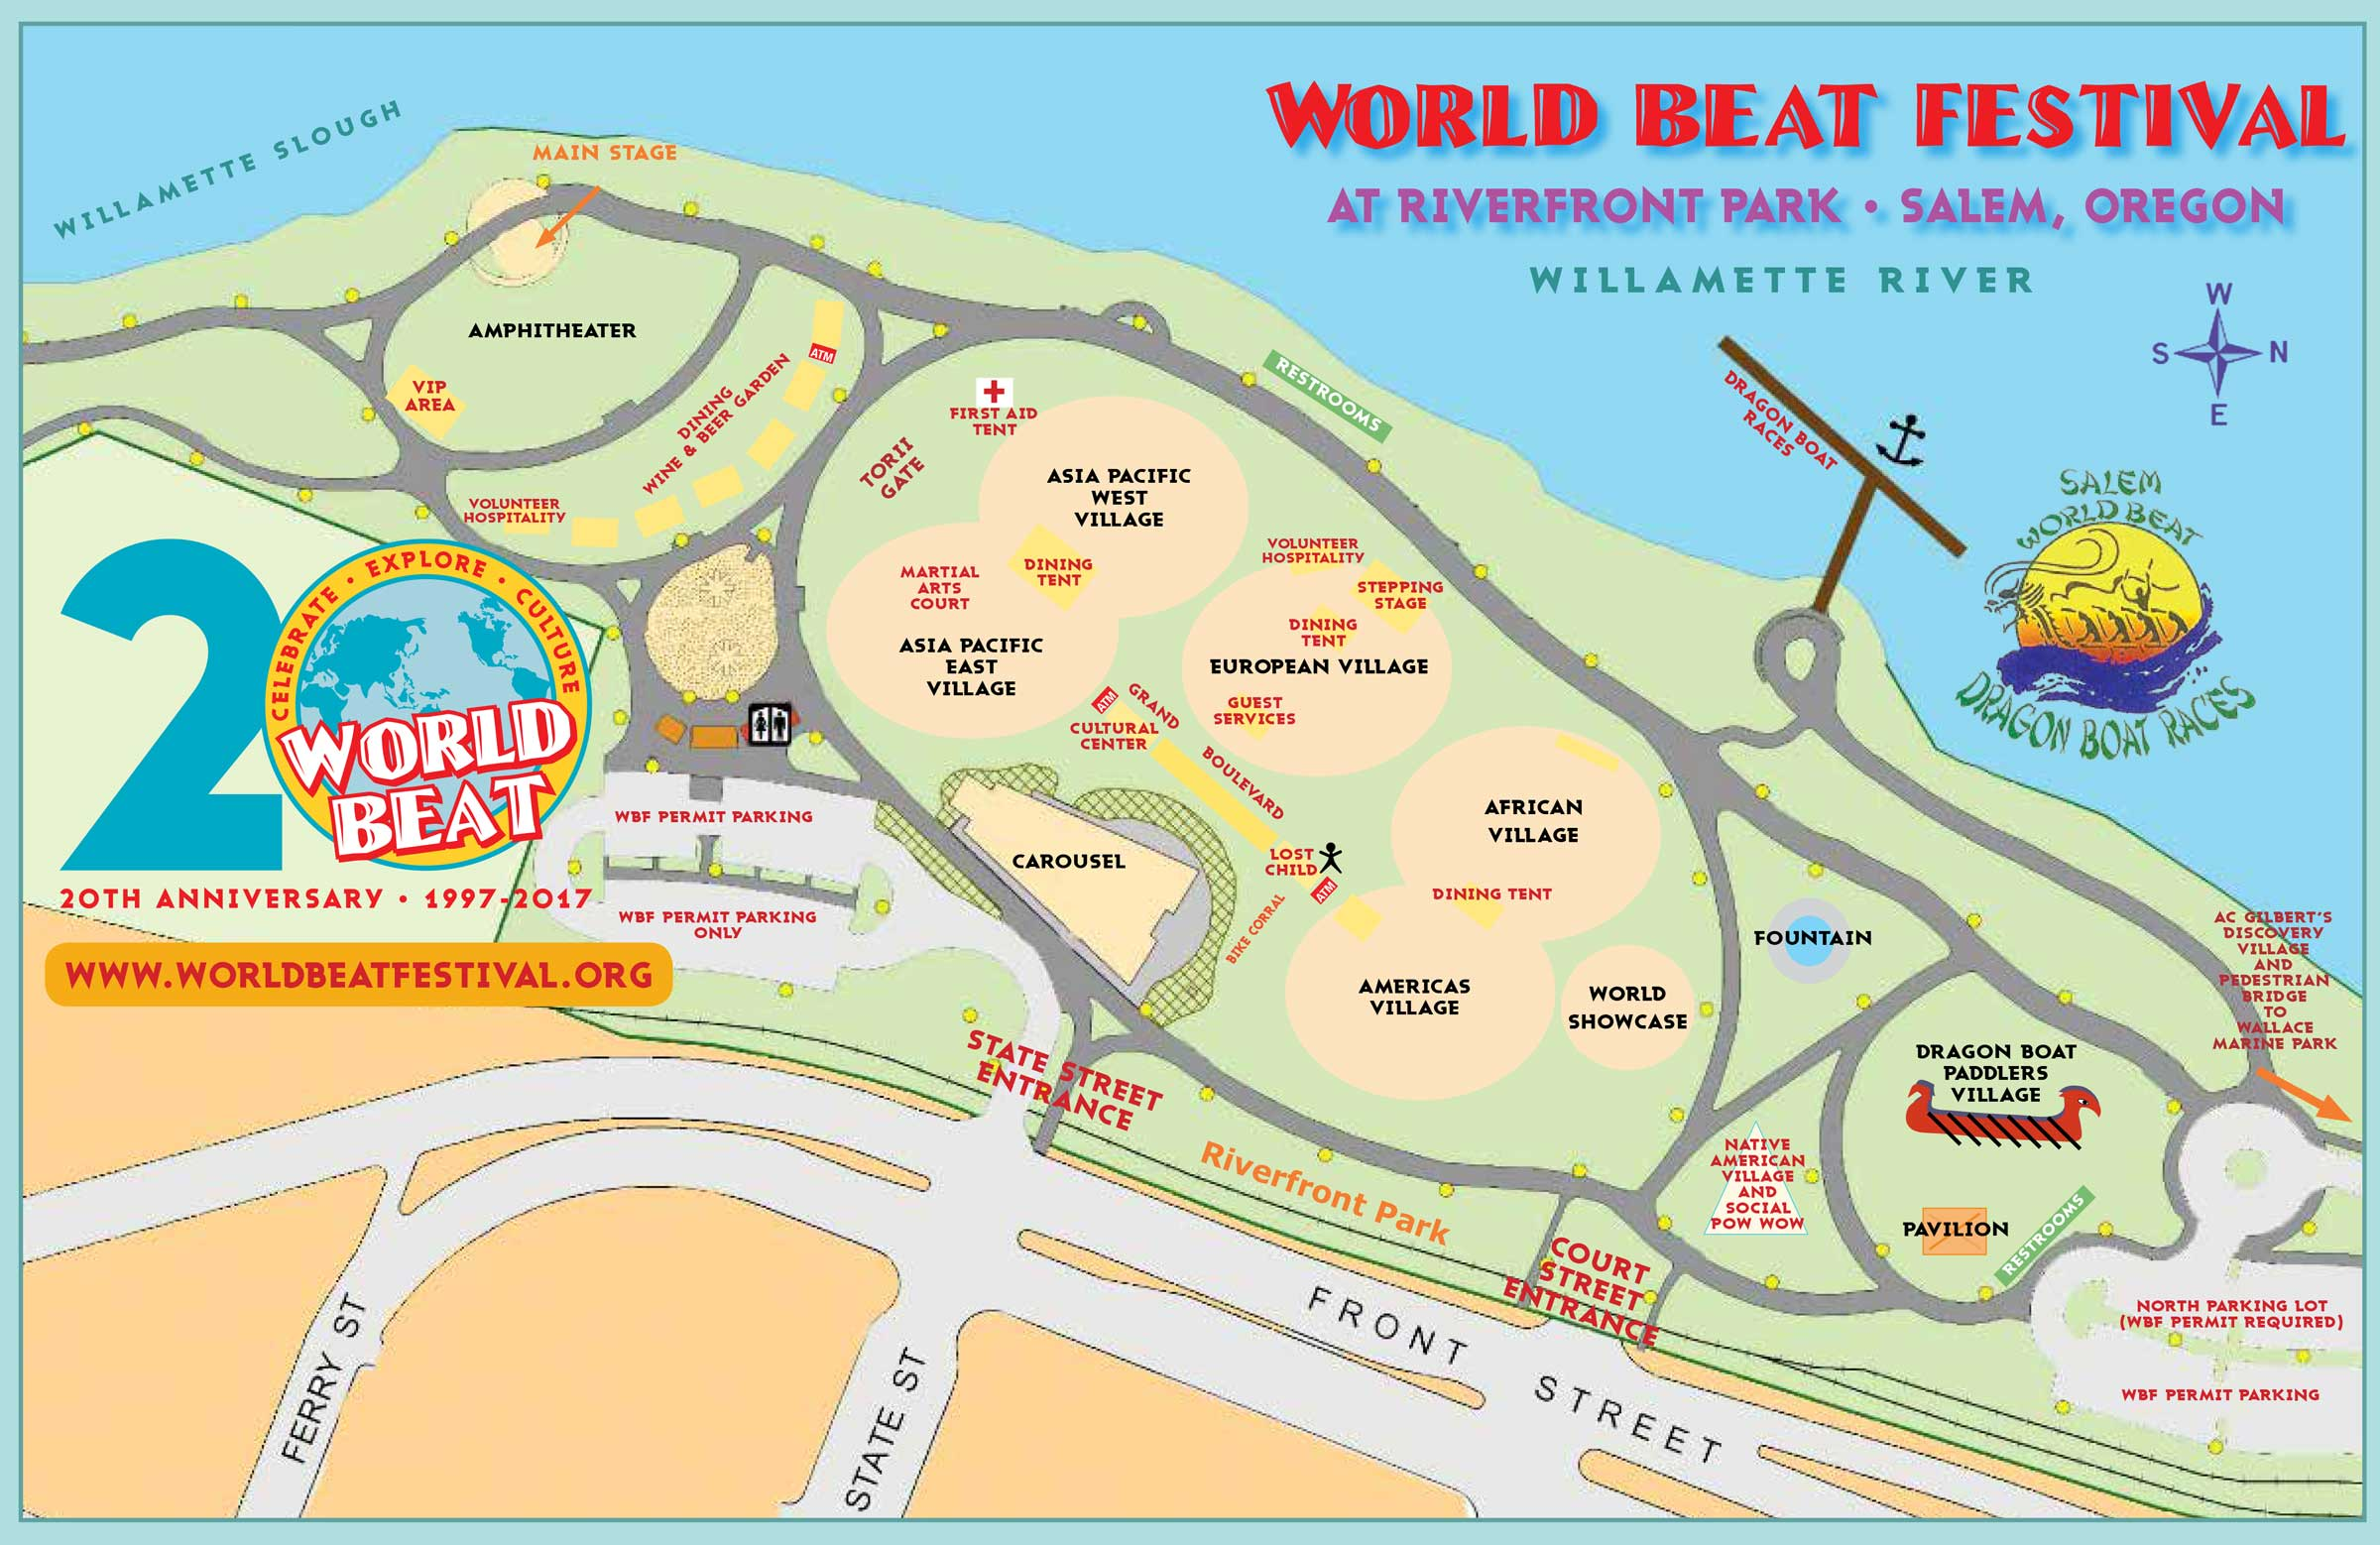 world beat festival 2017